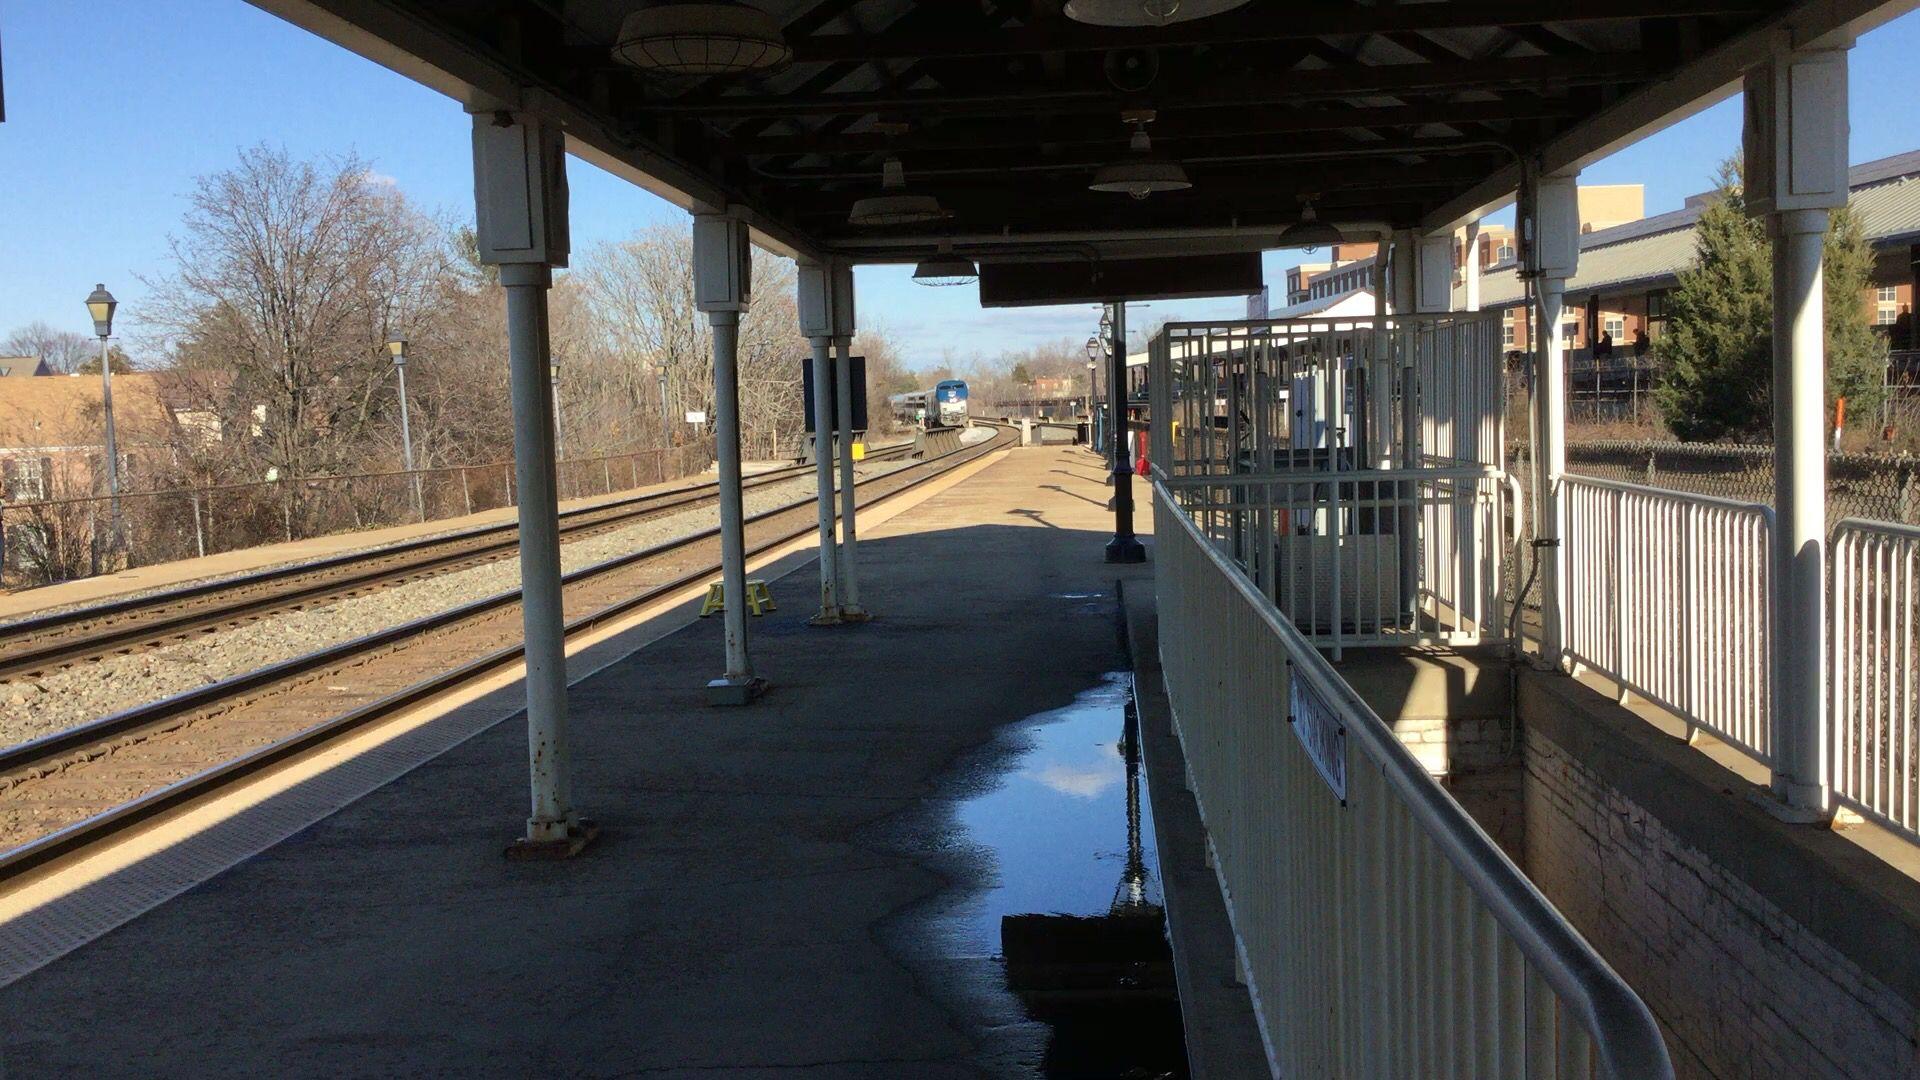 Amtrak arriving alexandrias union station photo by kathy